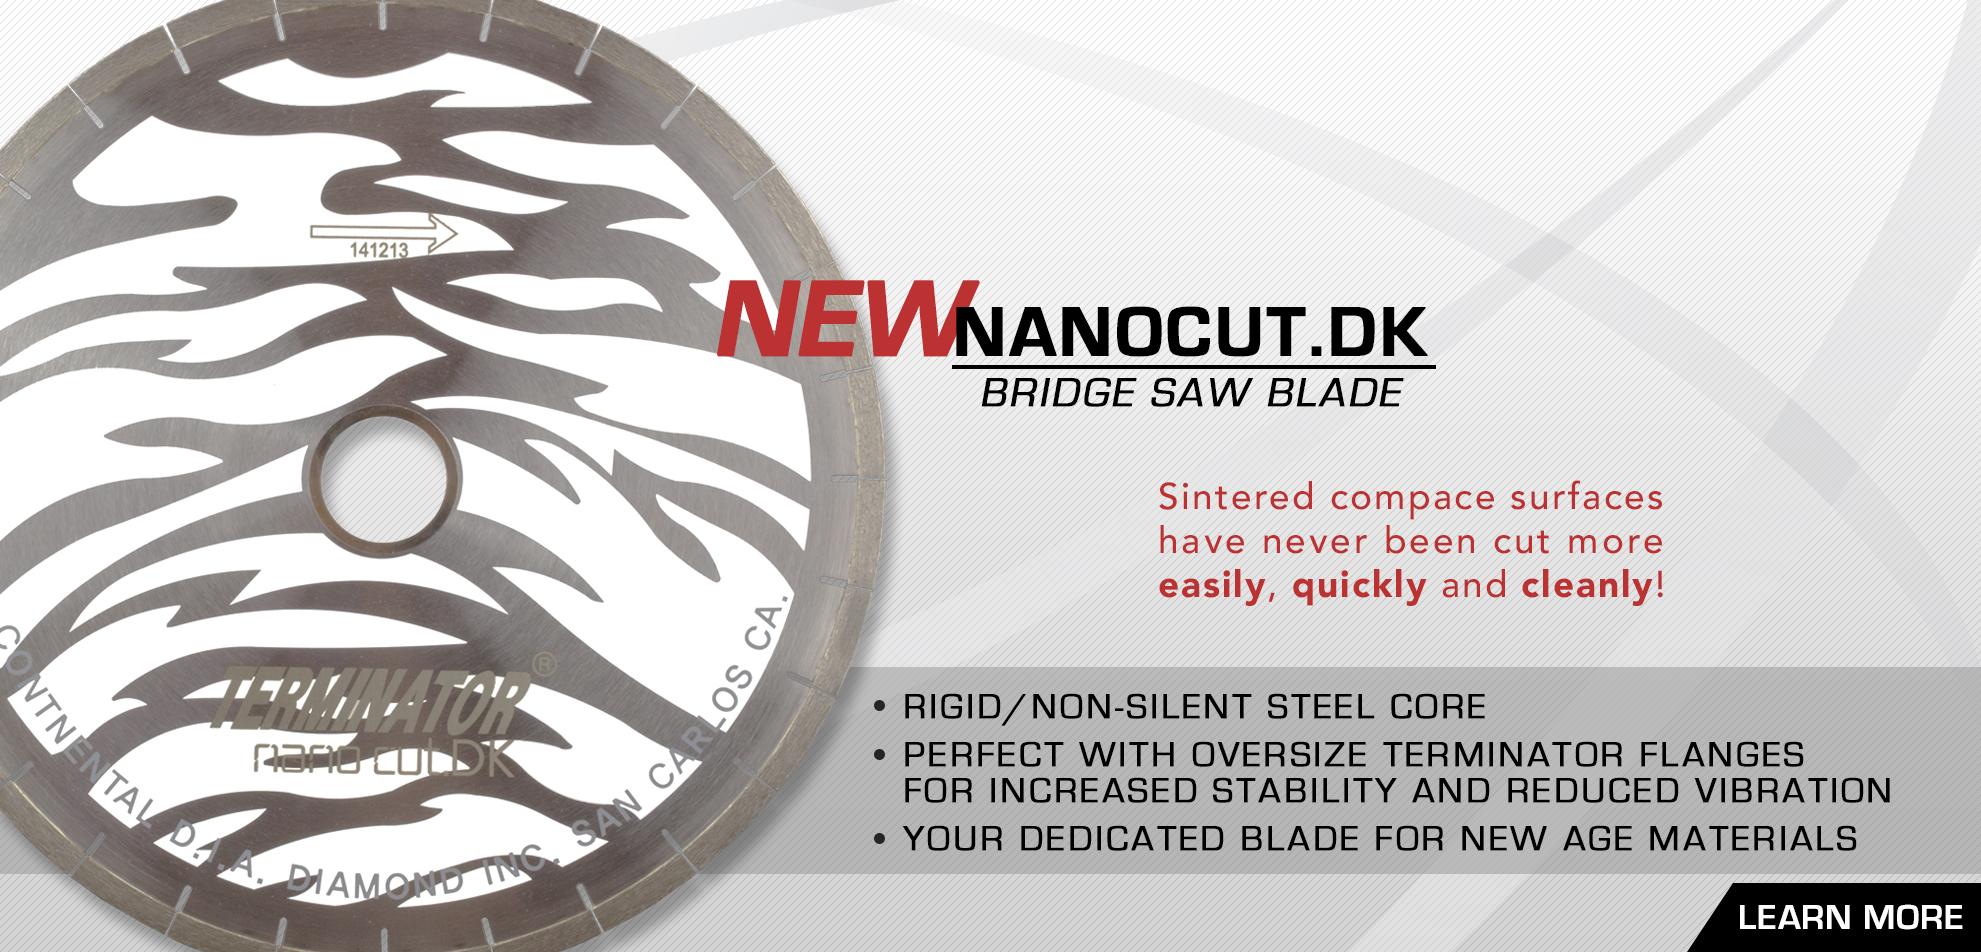 NanoCut.DK Bridge Saw Blade